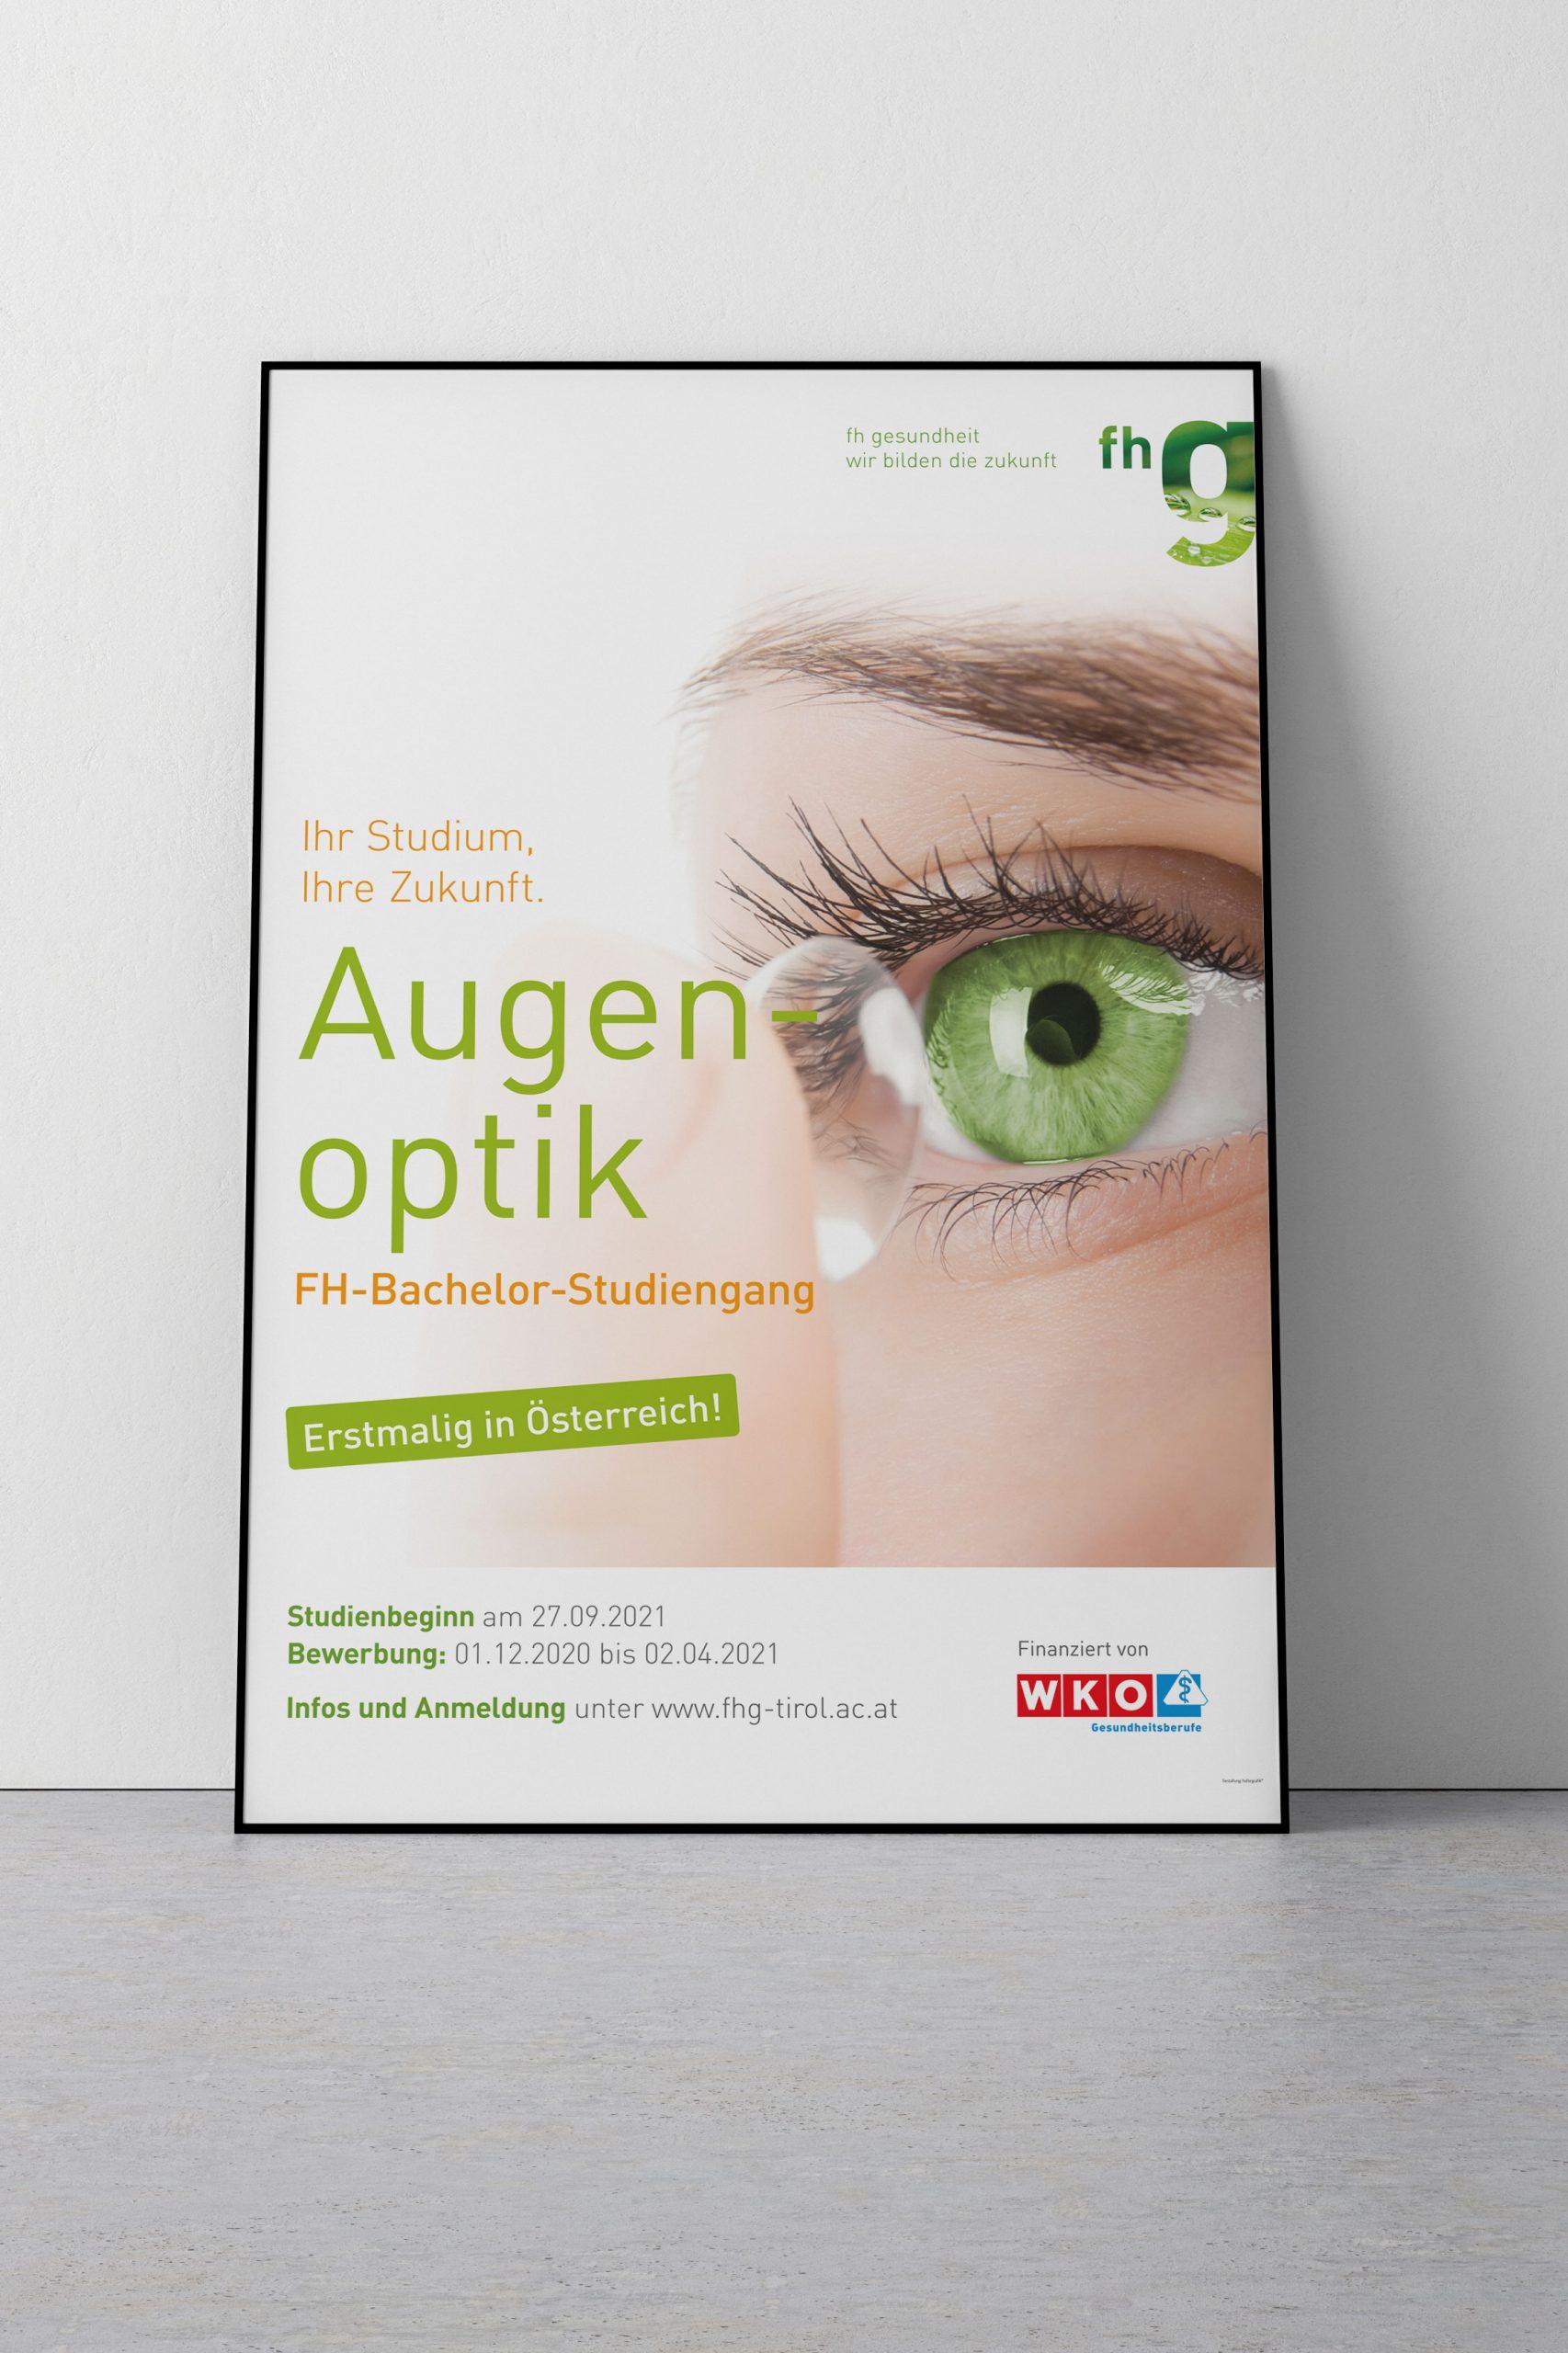 Plakat für fhg Studiengang Augenoptik